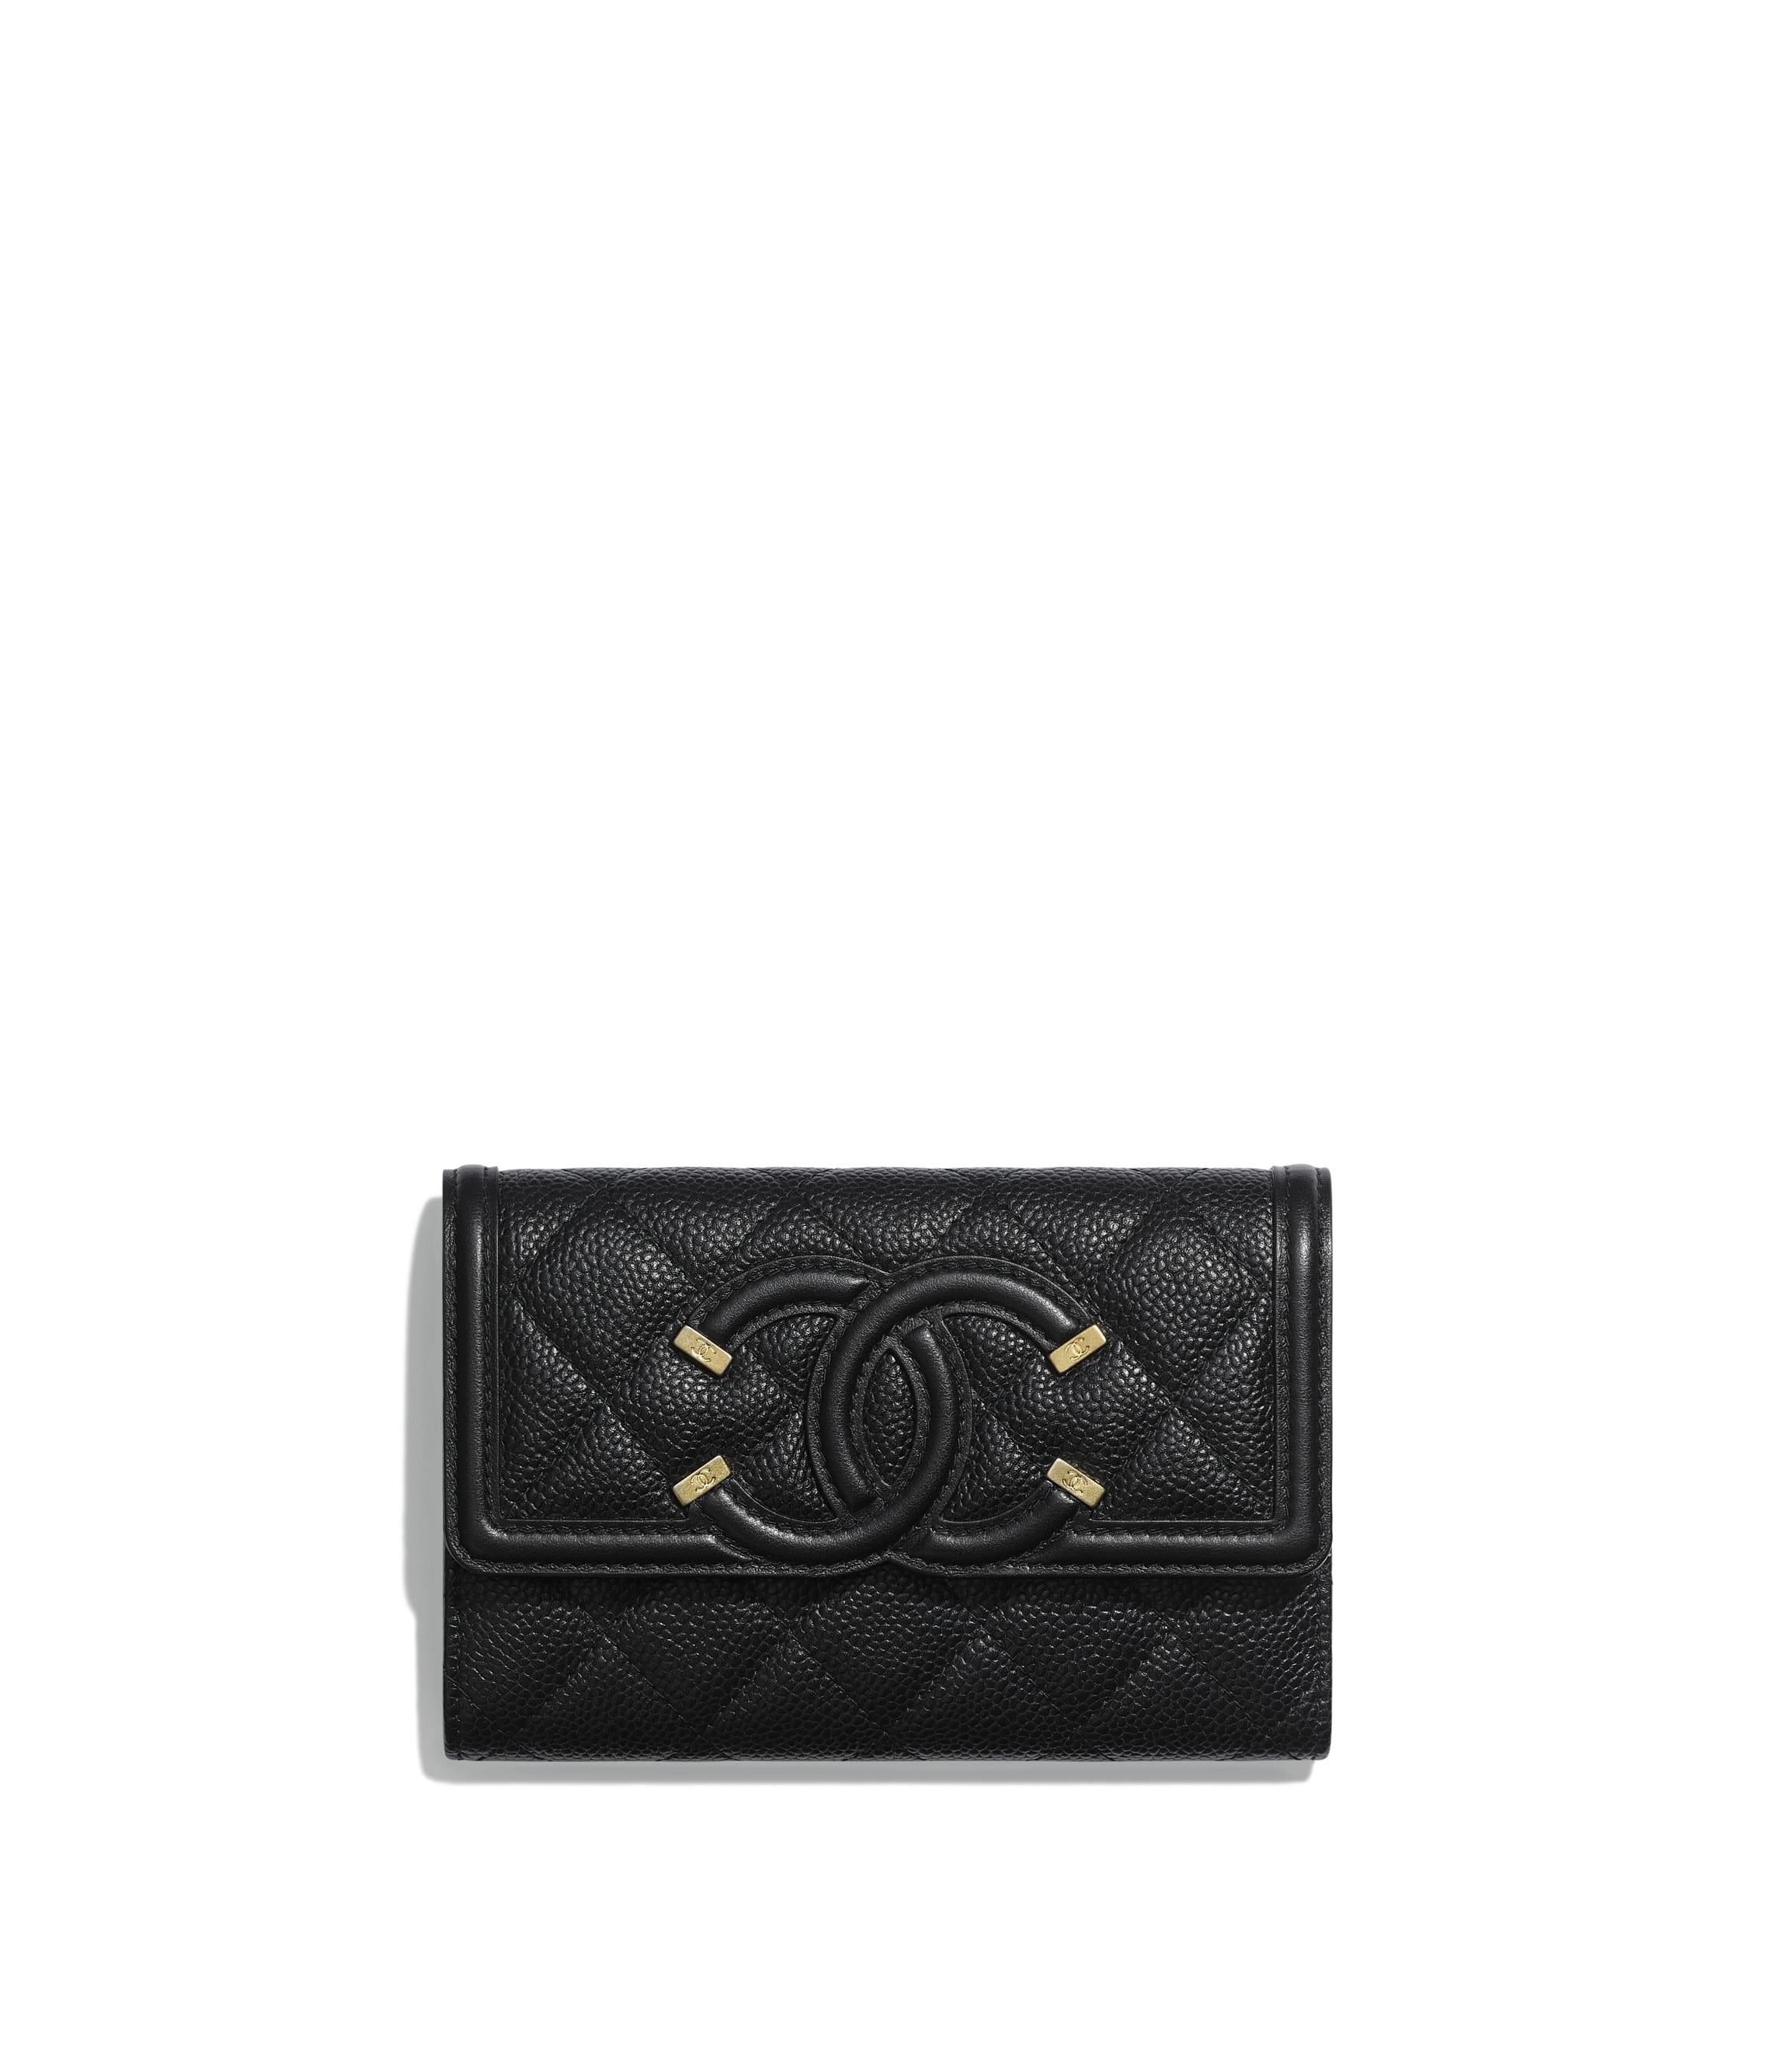 7ee672fa8e90d1 Flap Wallet. Grained Calfskin, Smooth Calfskin & Gold-Tone Metal. Black